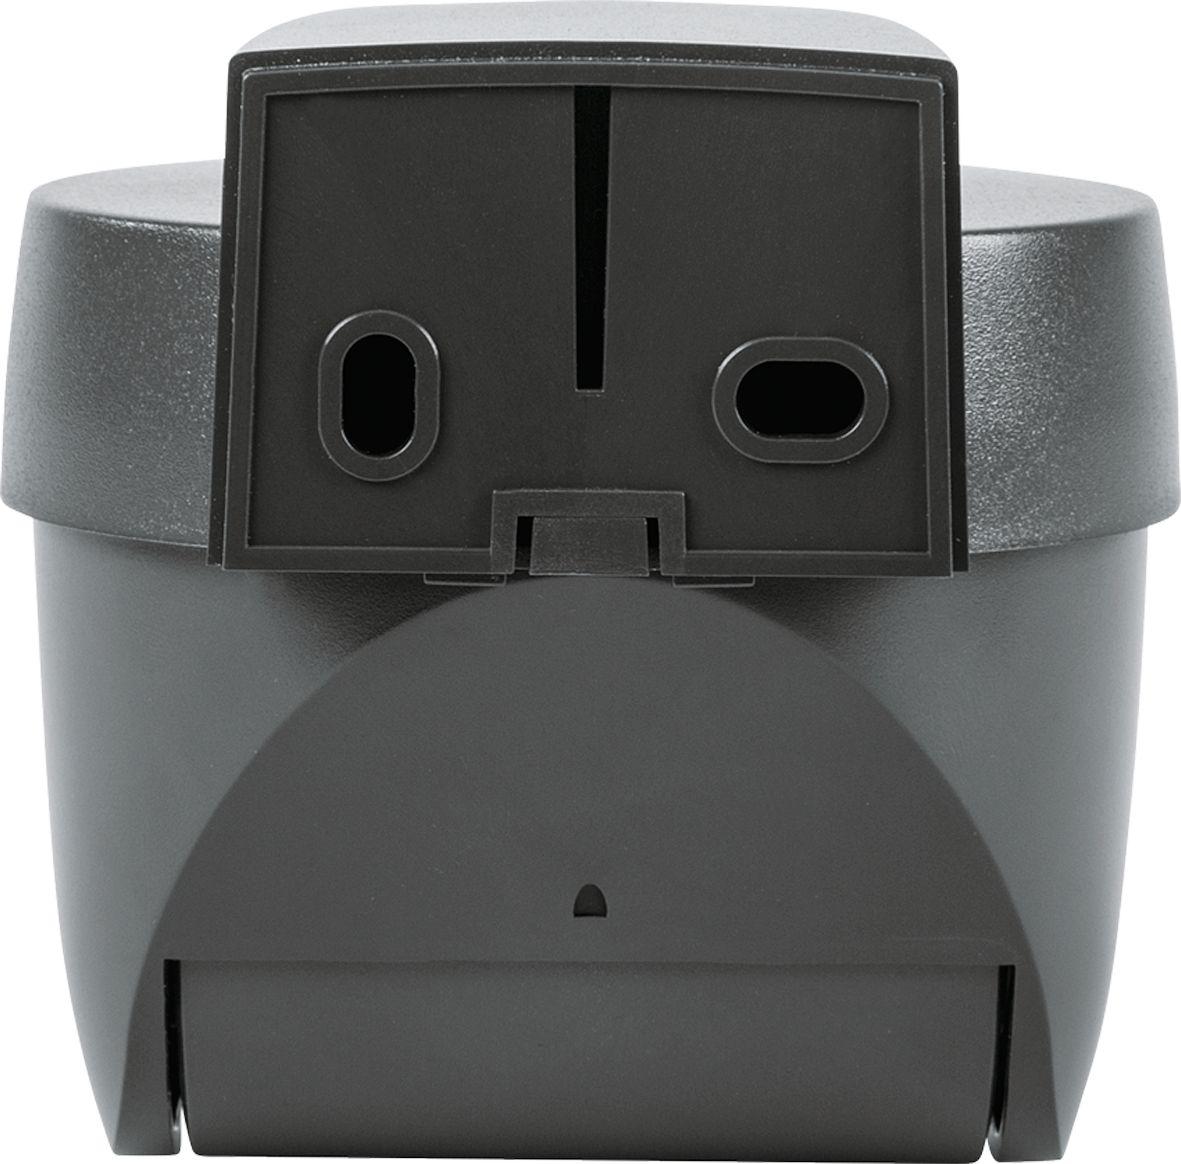 homematic ip bewegungsmelder mit d mmerungssensor f r au en smart home g nstig kaufen. Black Bedroom Furniture Sets. Home Design Ideas